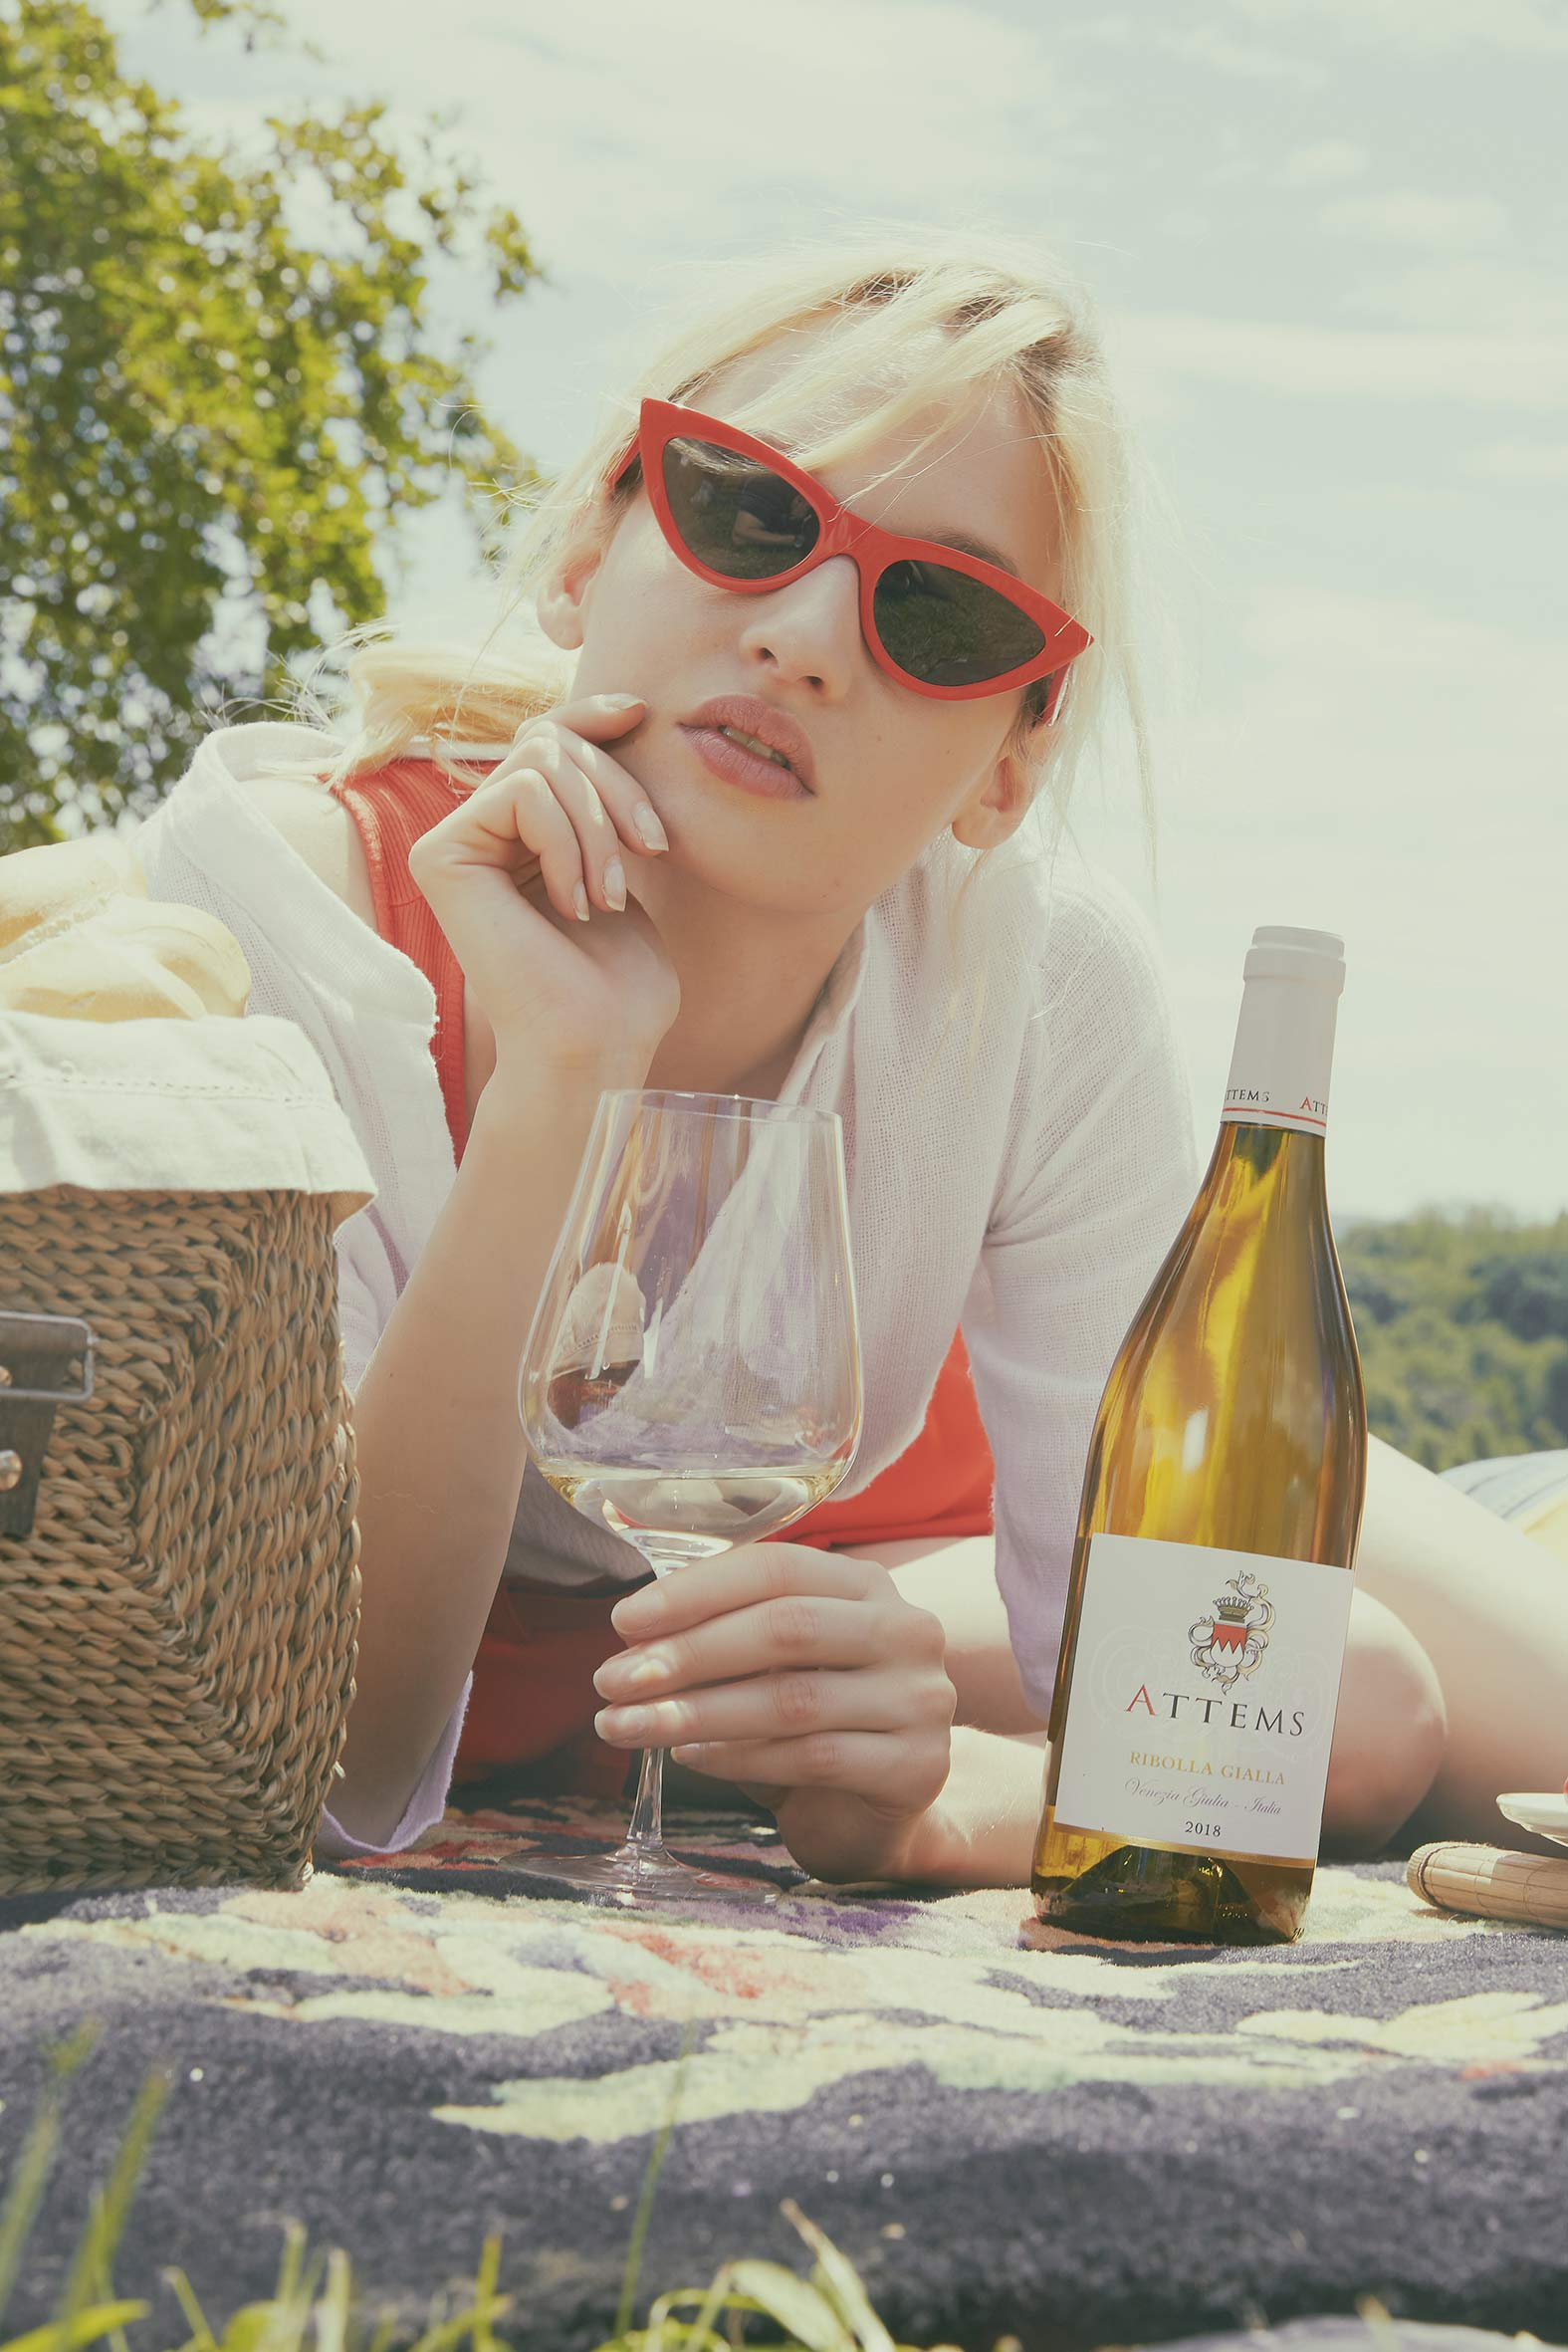 Attems Wine